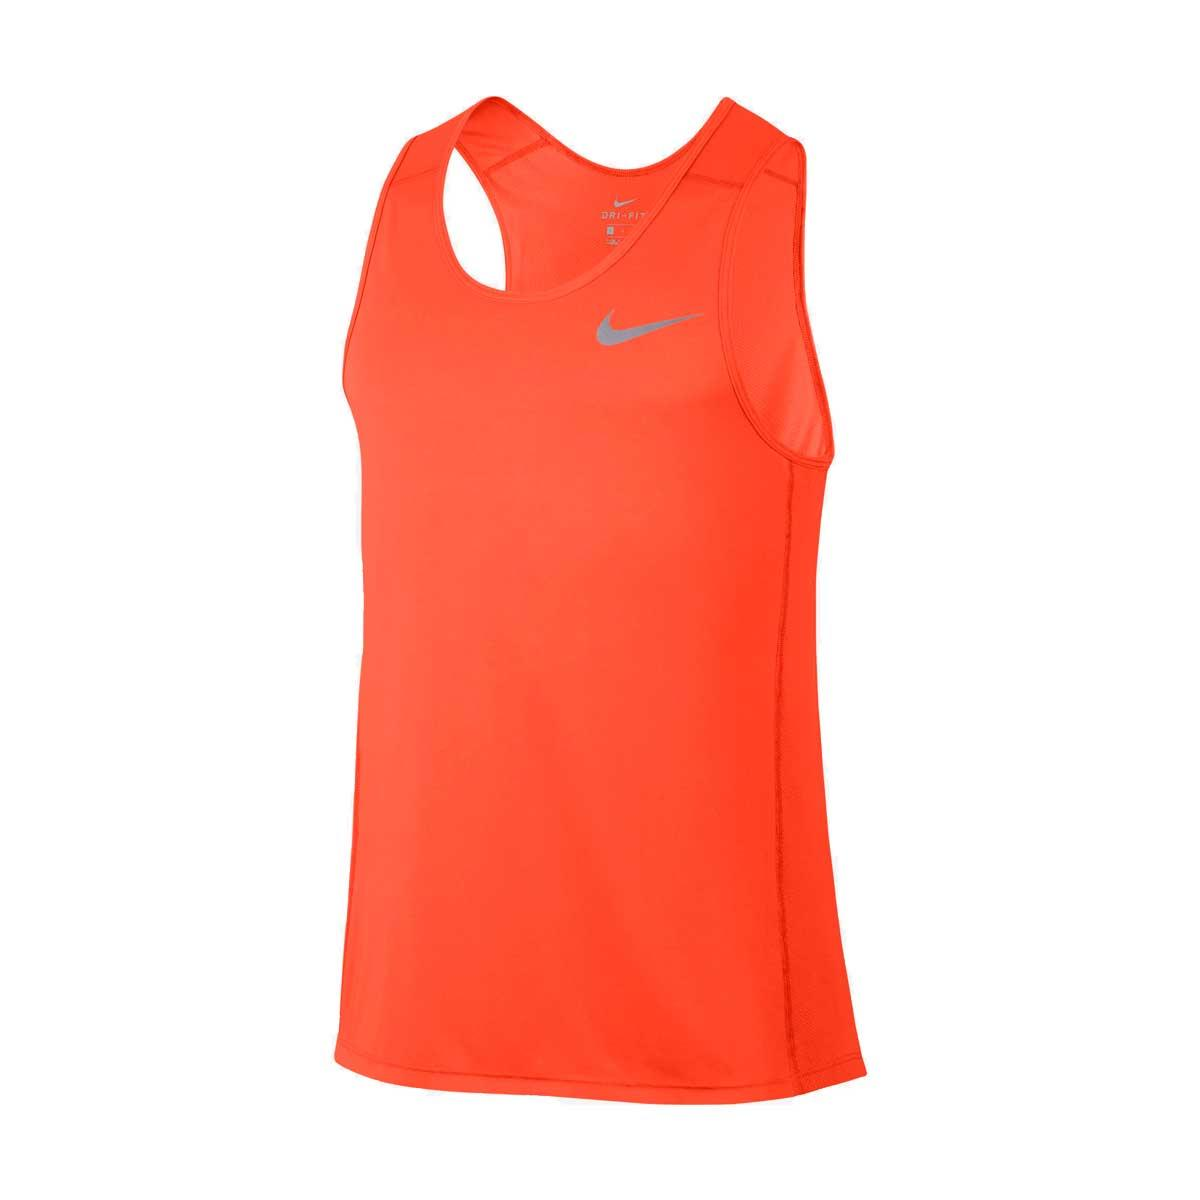 a89e87b2c3 Camiseta Regata Nike Dry Miler Masculino